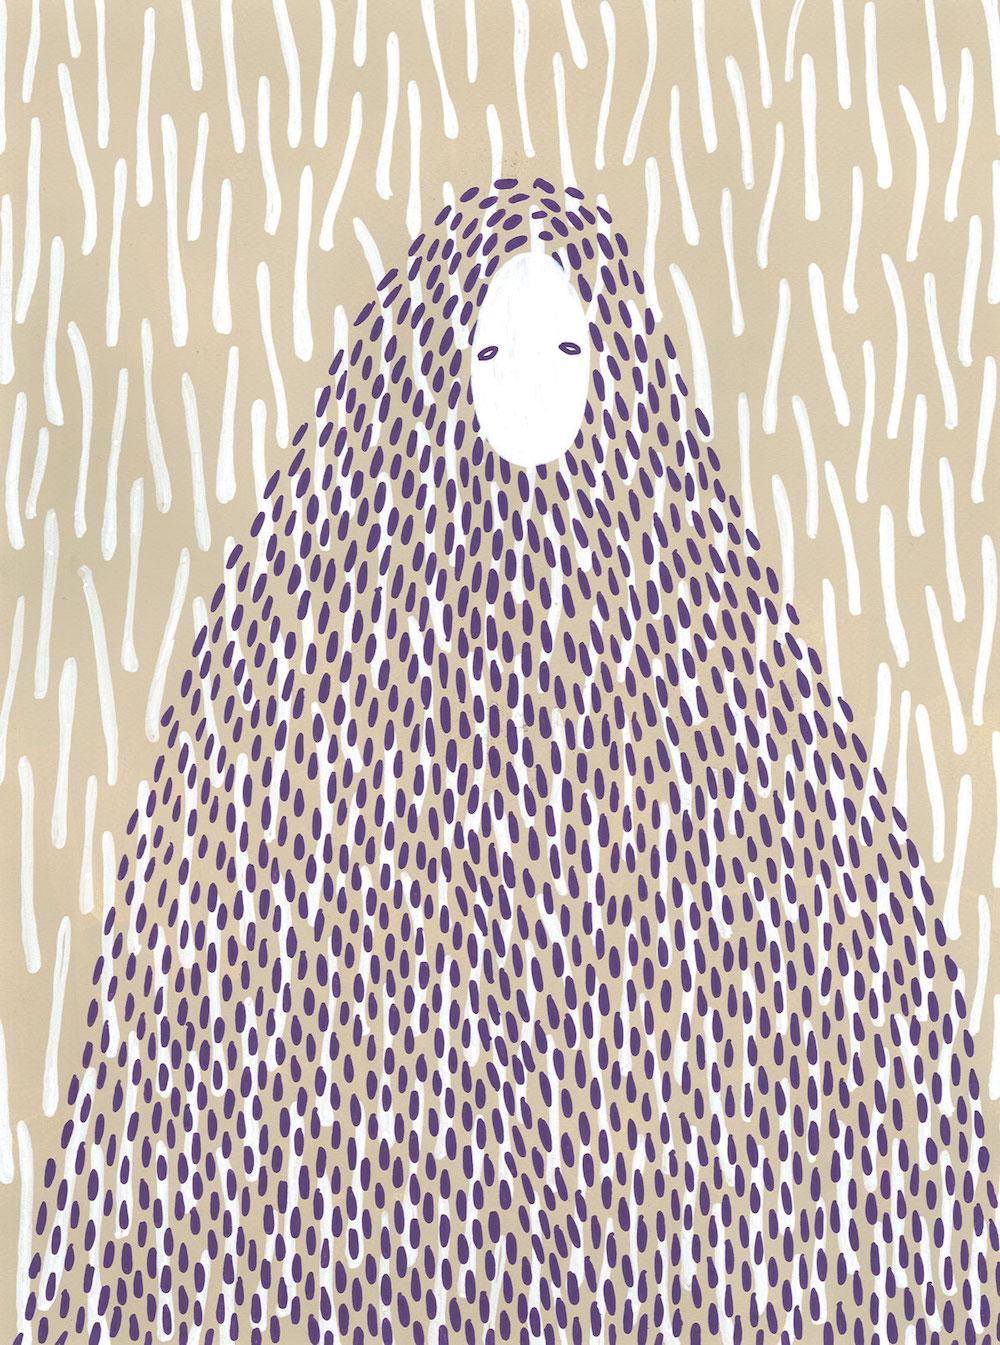 illustration, illustrations, illustrator, illustrators, cloak, cloaks, eyes, eye, lines, oval, droplet, droplets, grain, grains, beige, tan, sad